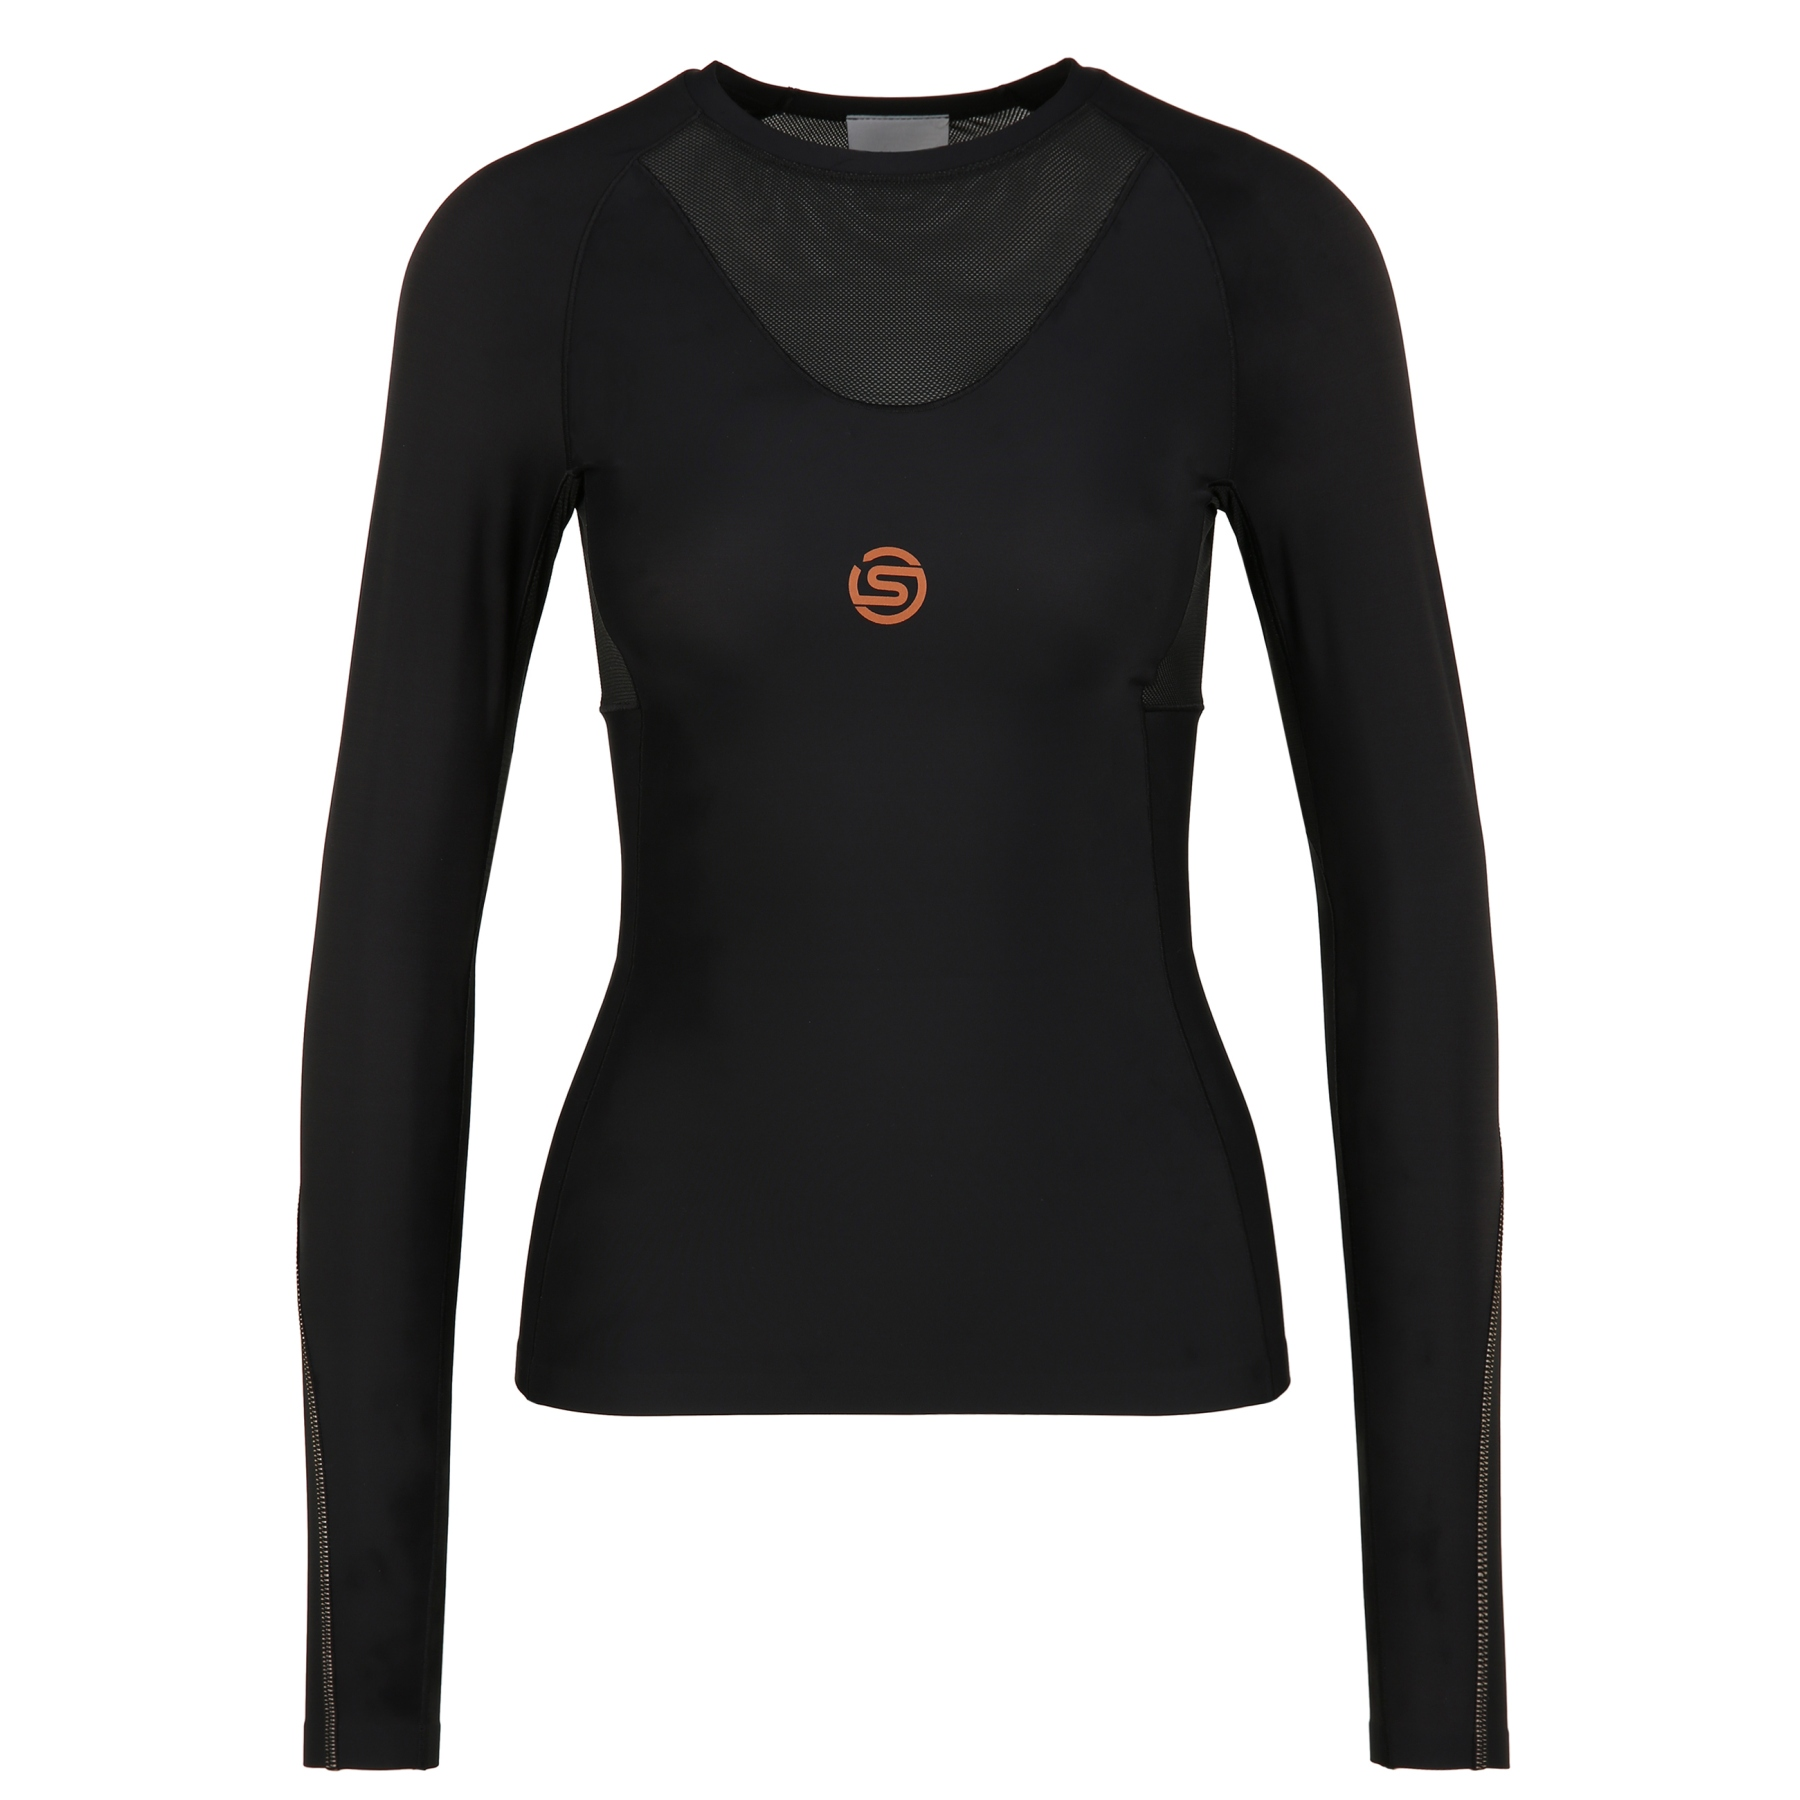 SKINS Compression 5-Series Longsleeve Shirt Women - Black